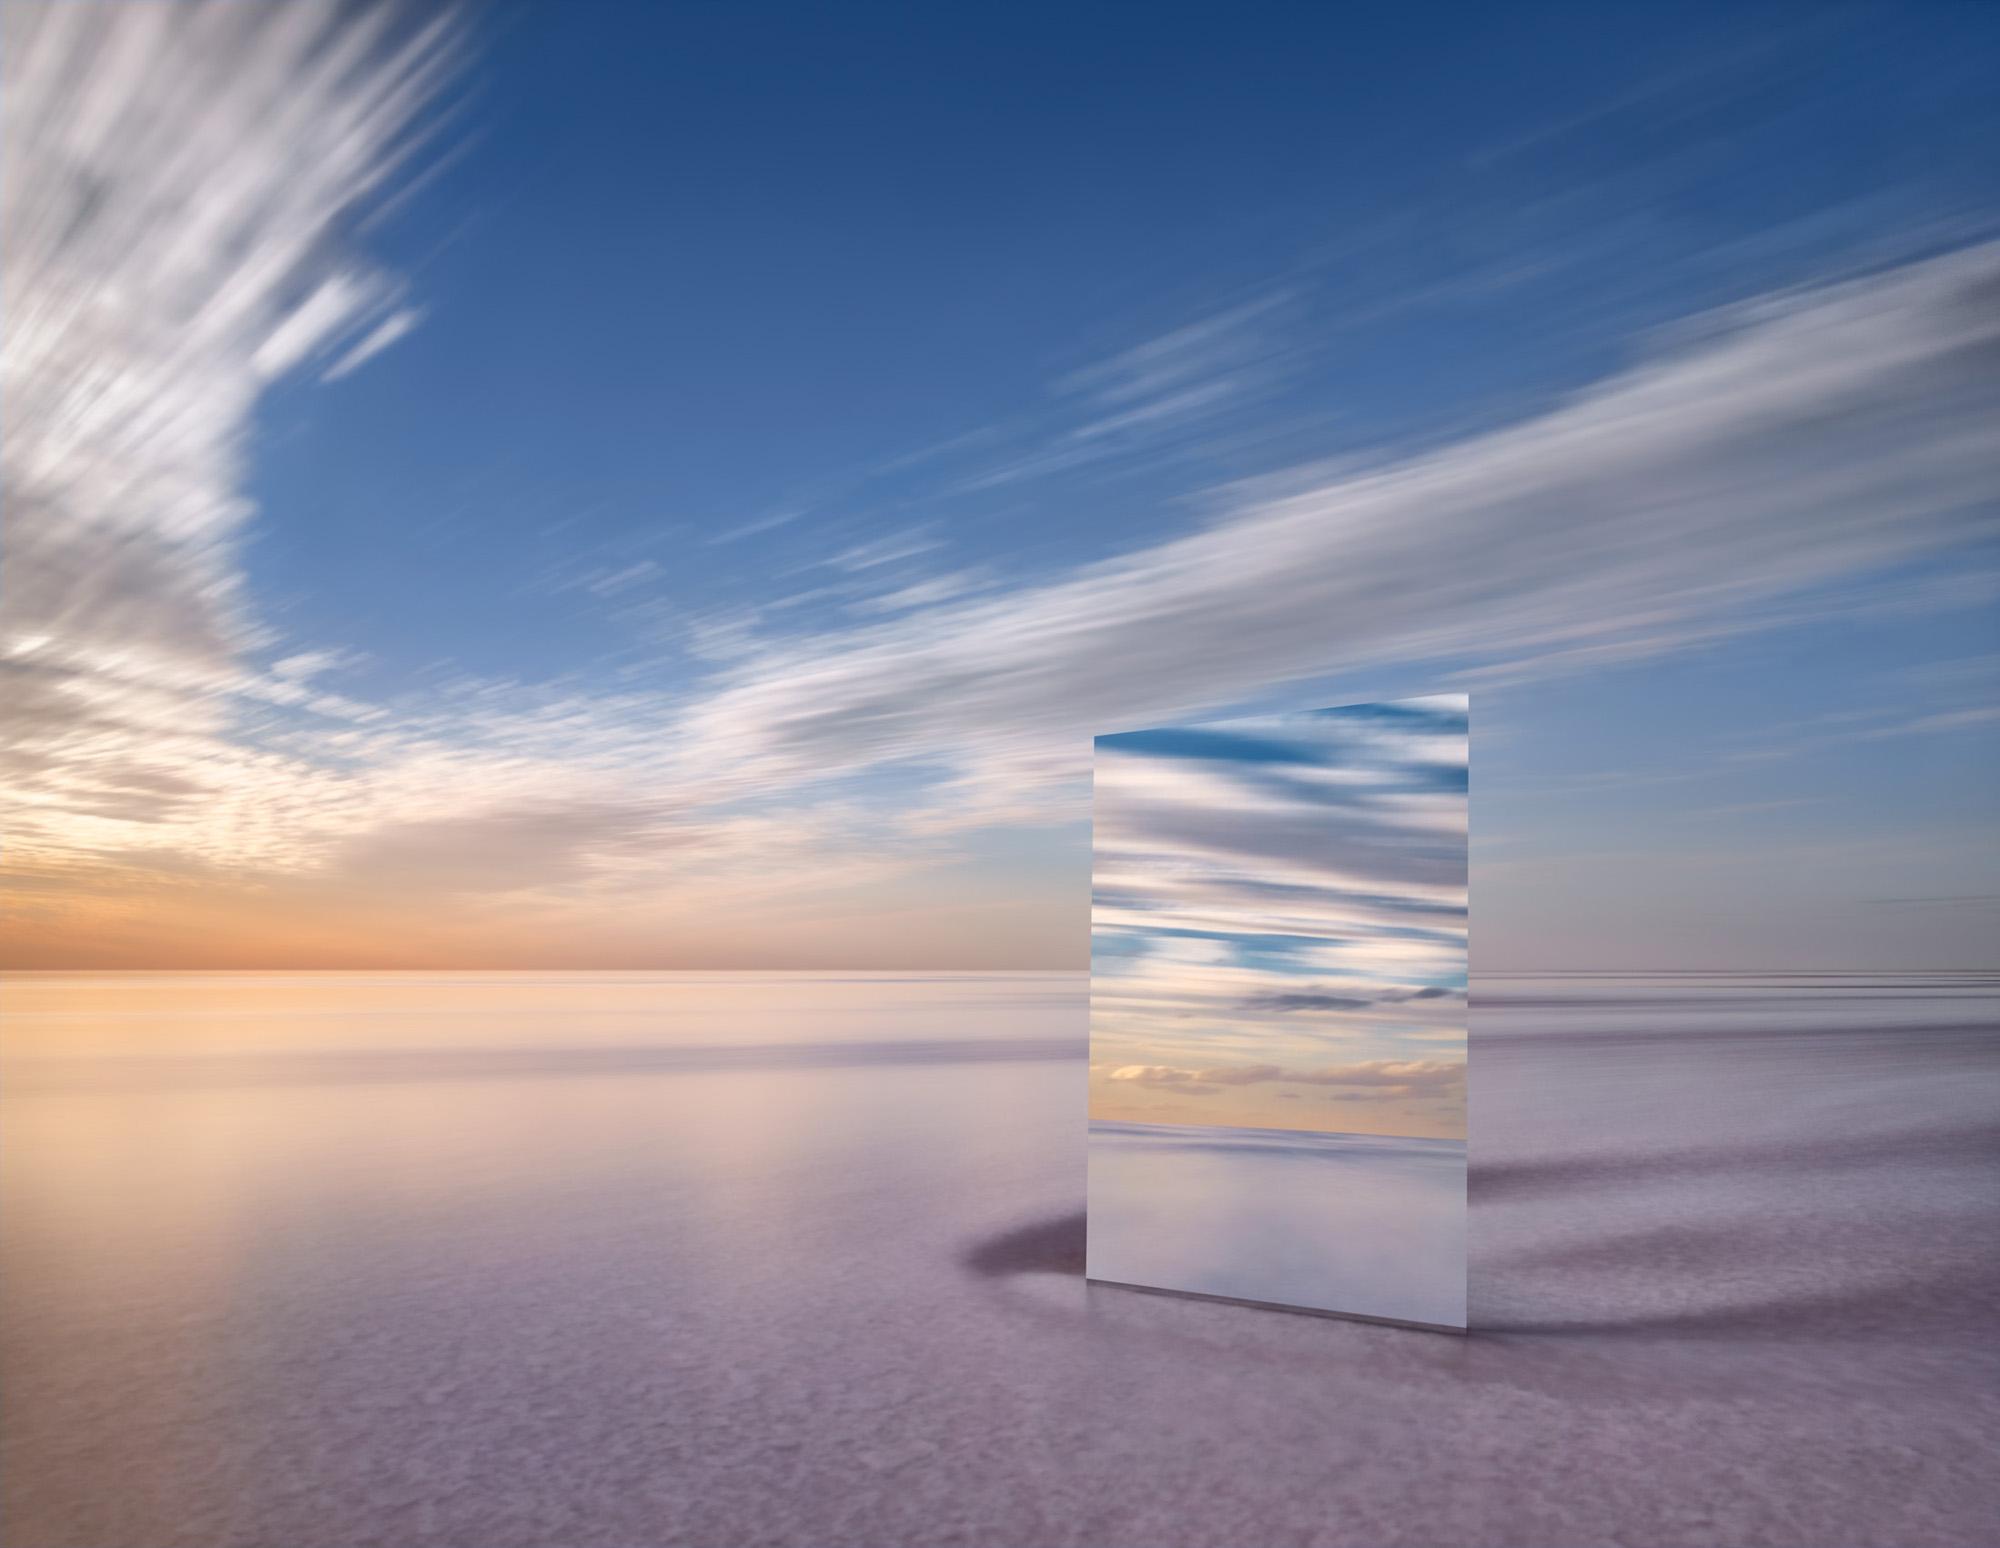 MURRAY FREDERICKS   Mirror 17  2017 Digital pigment print on cotton rag 120 x 155 cm Frame: 144 x 179 cm